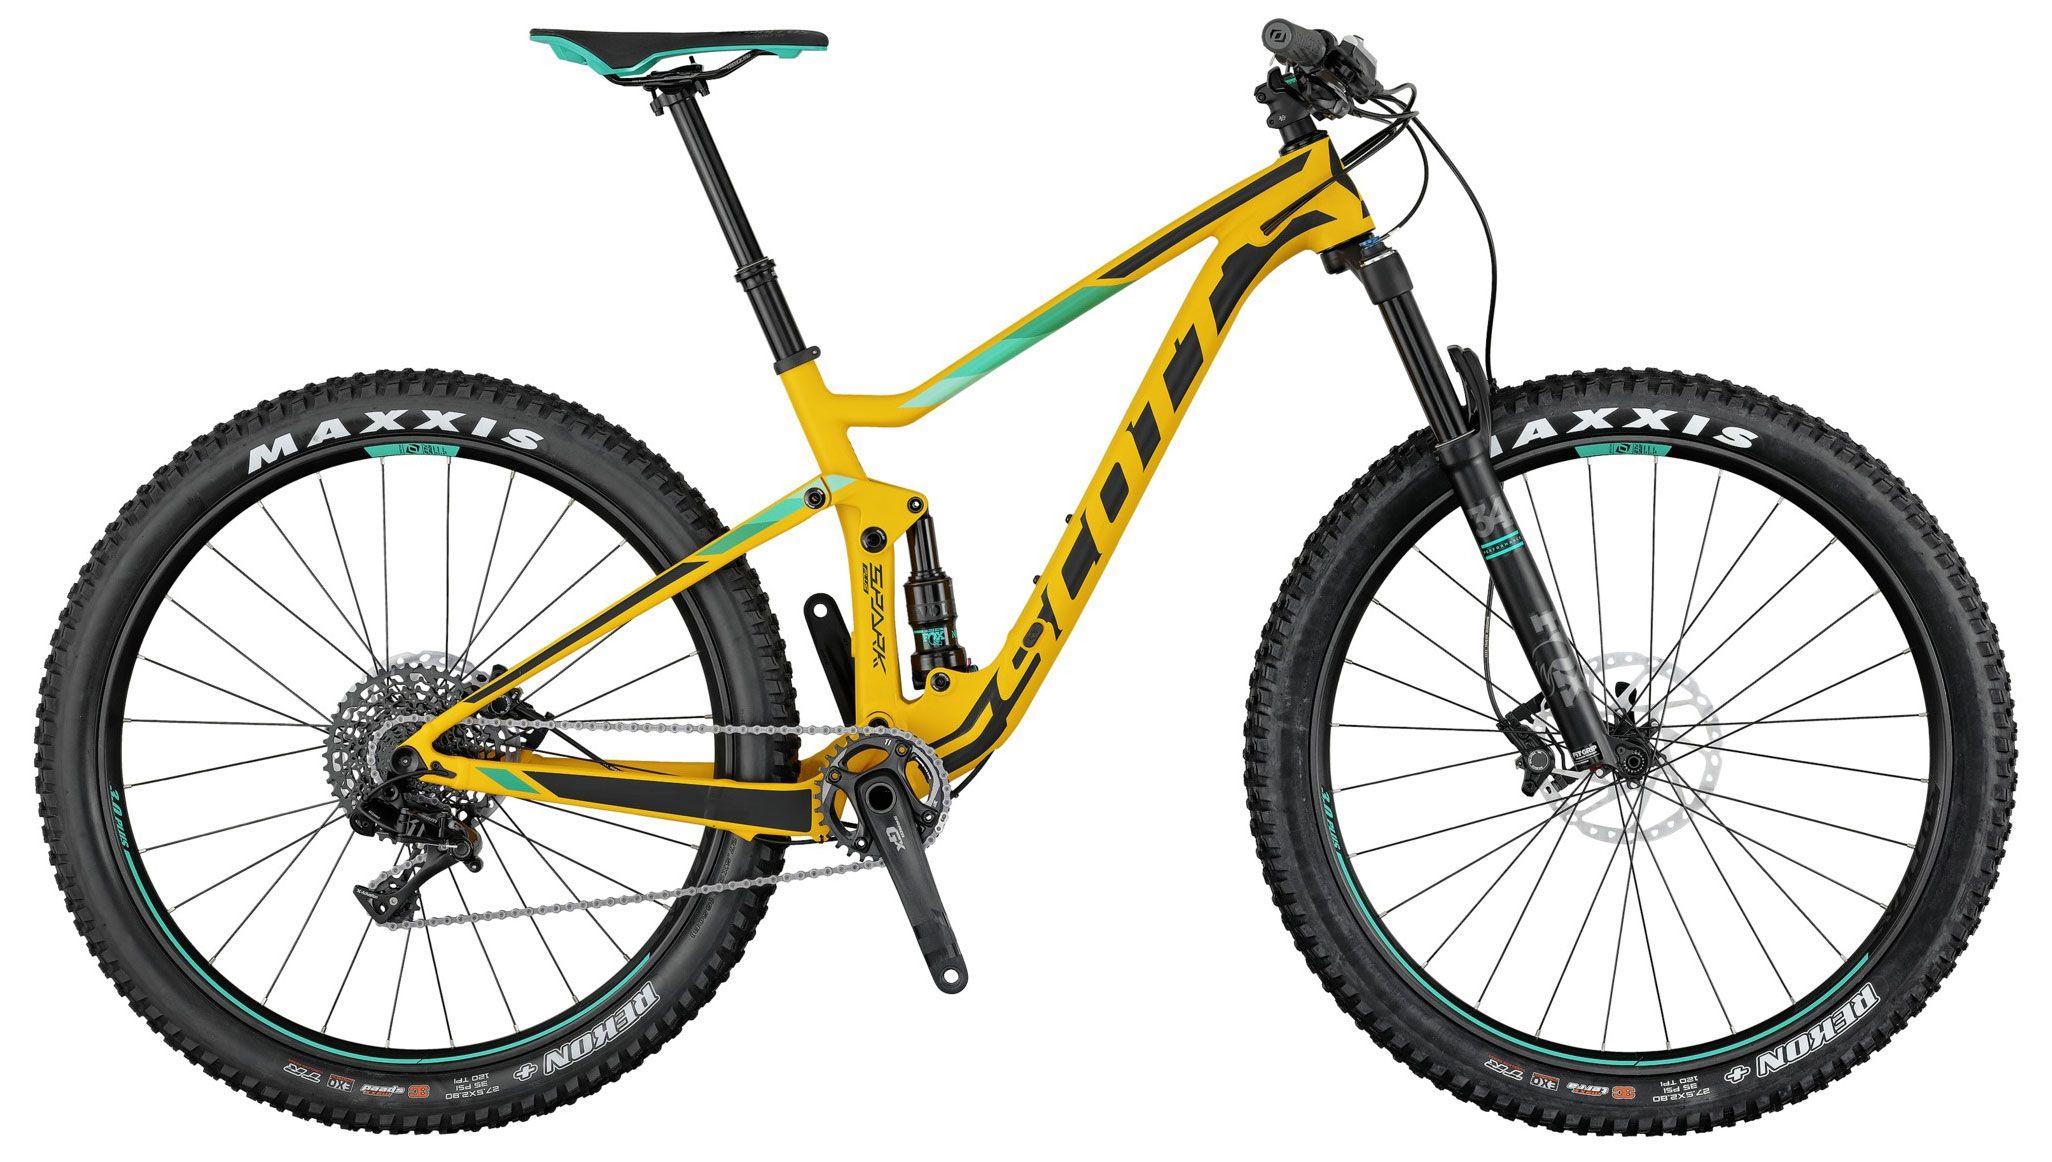 Велосипед Scott Spark 720 Plus 2017,  Двухподвесы  - артикул:276059